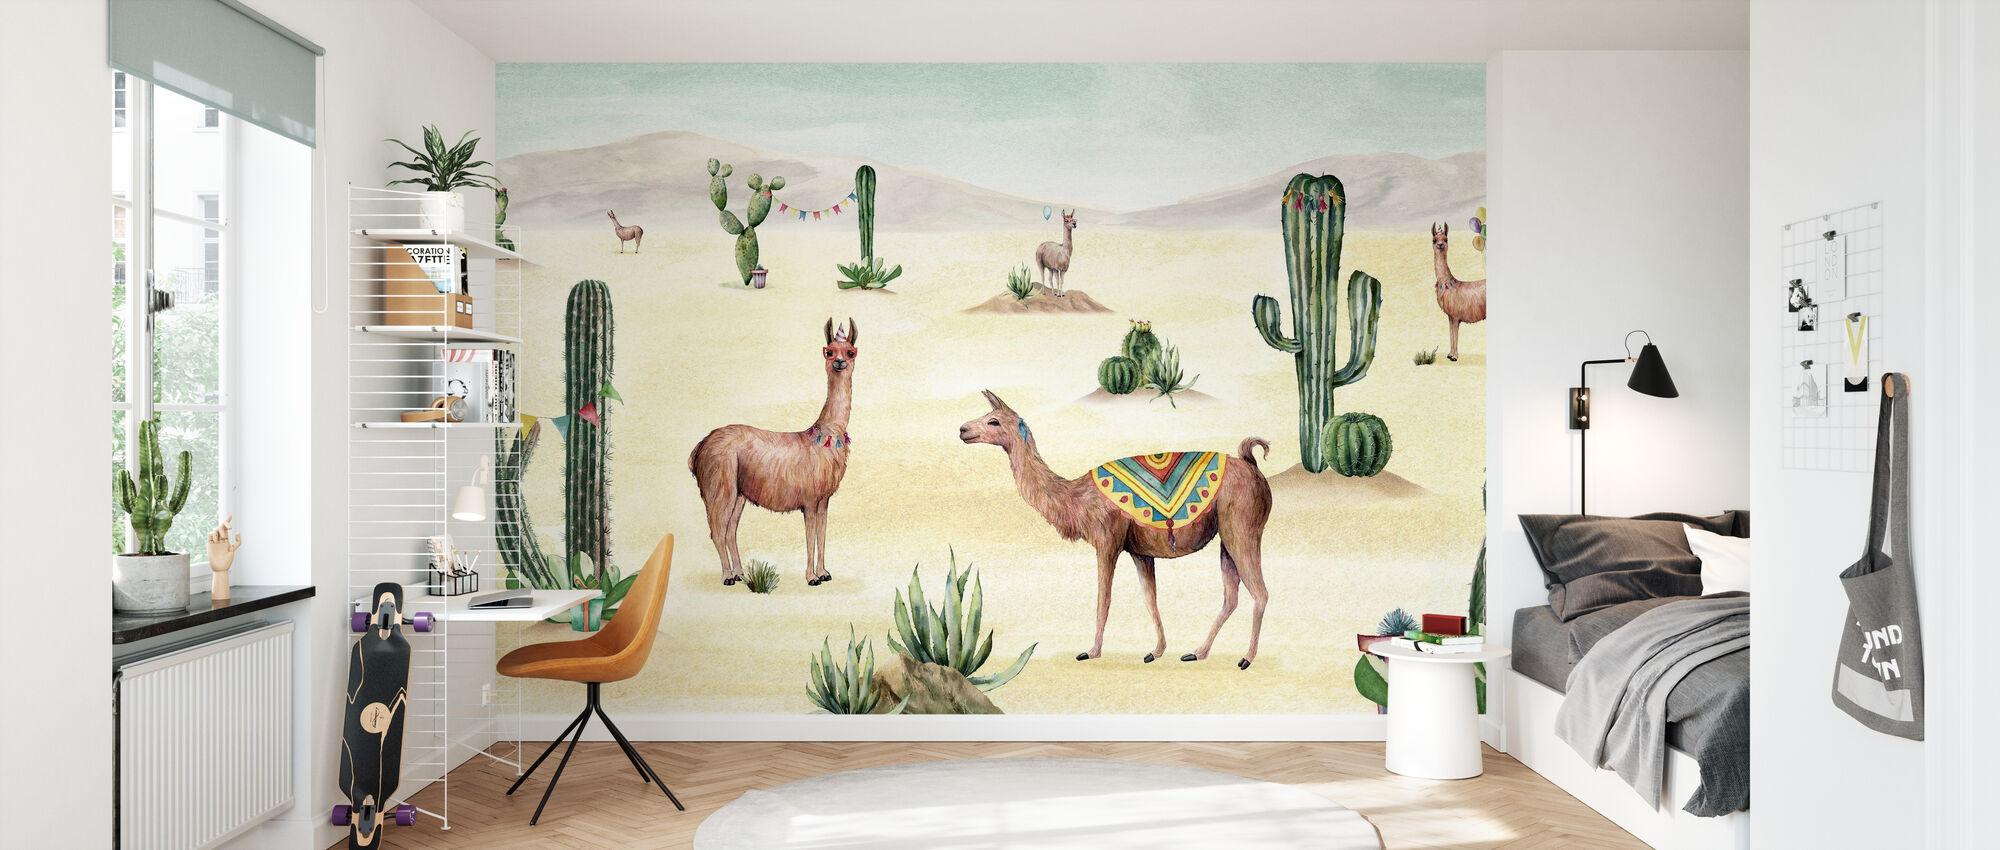 Laughing Lamas - Wallpaper - Kids Room